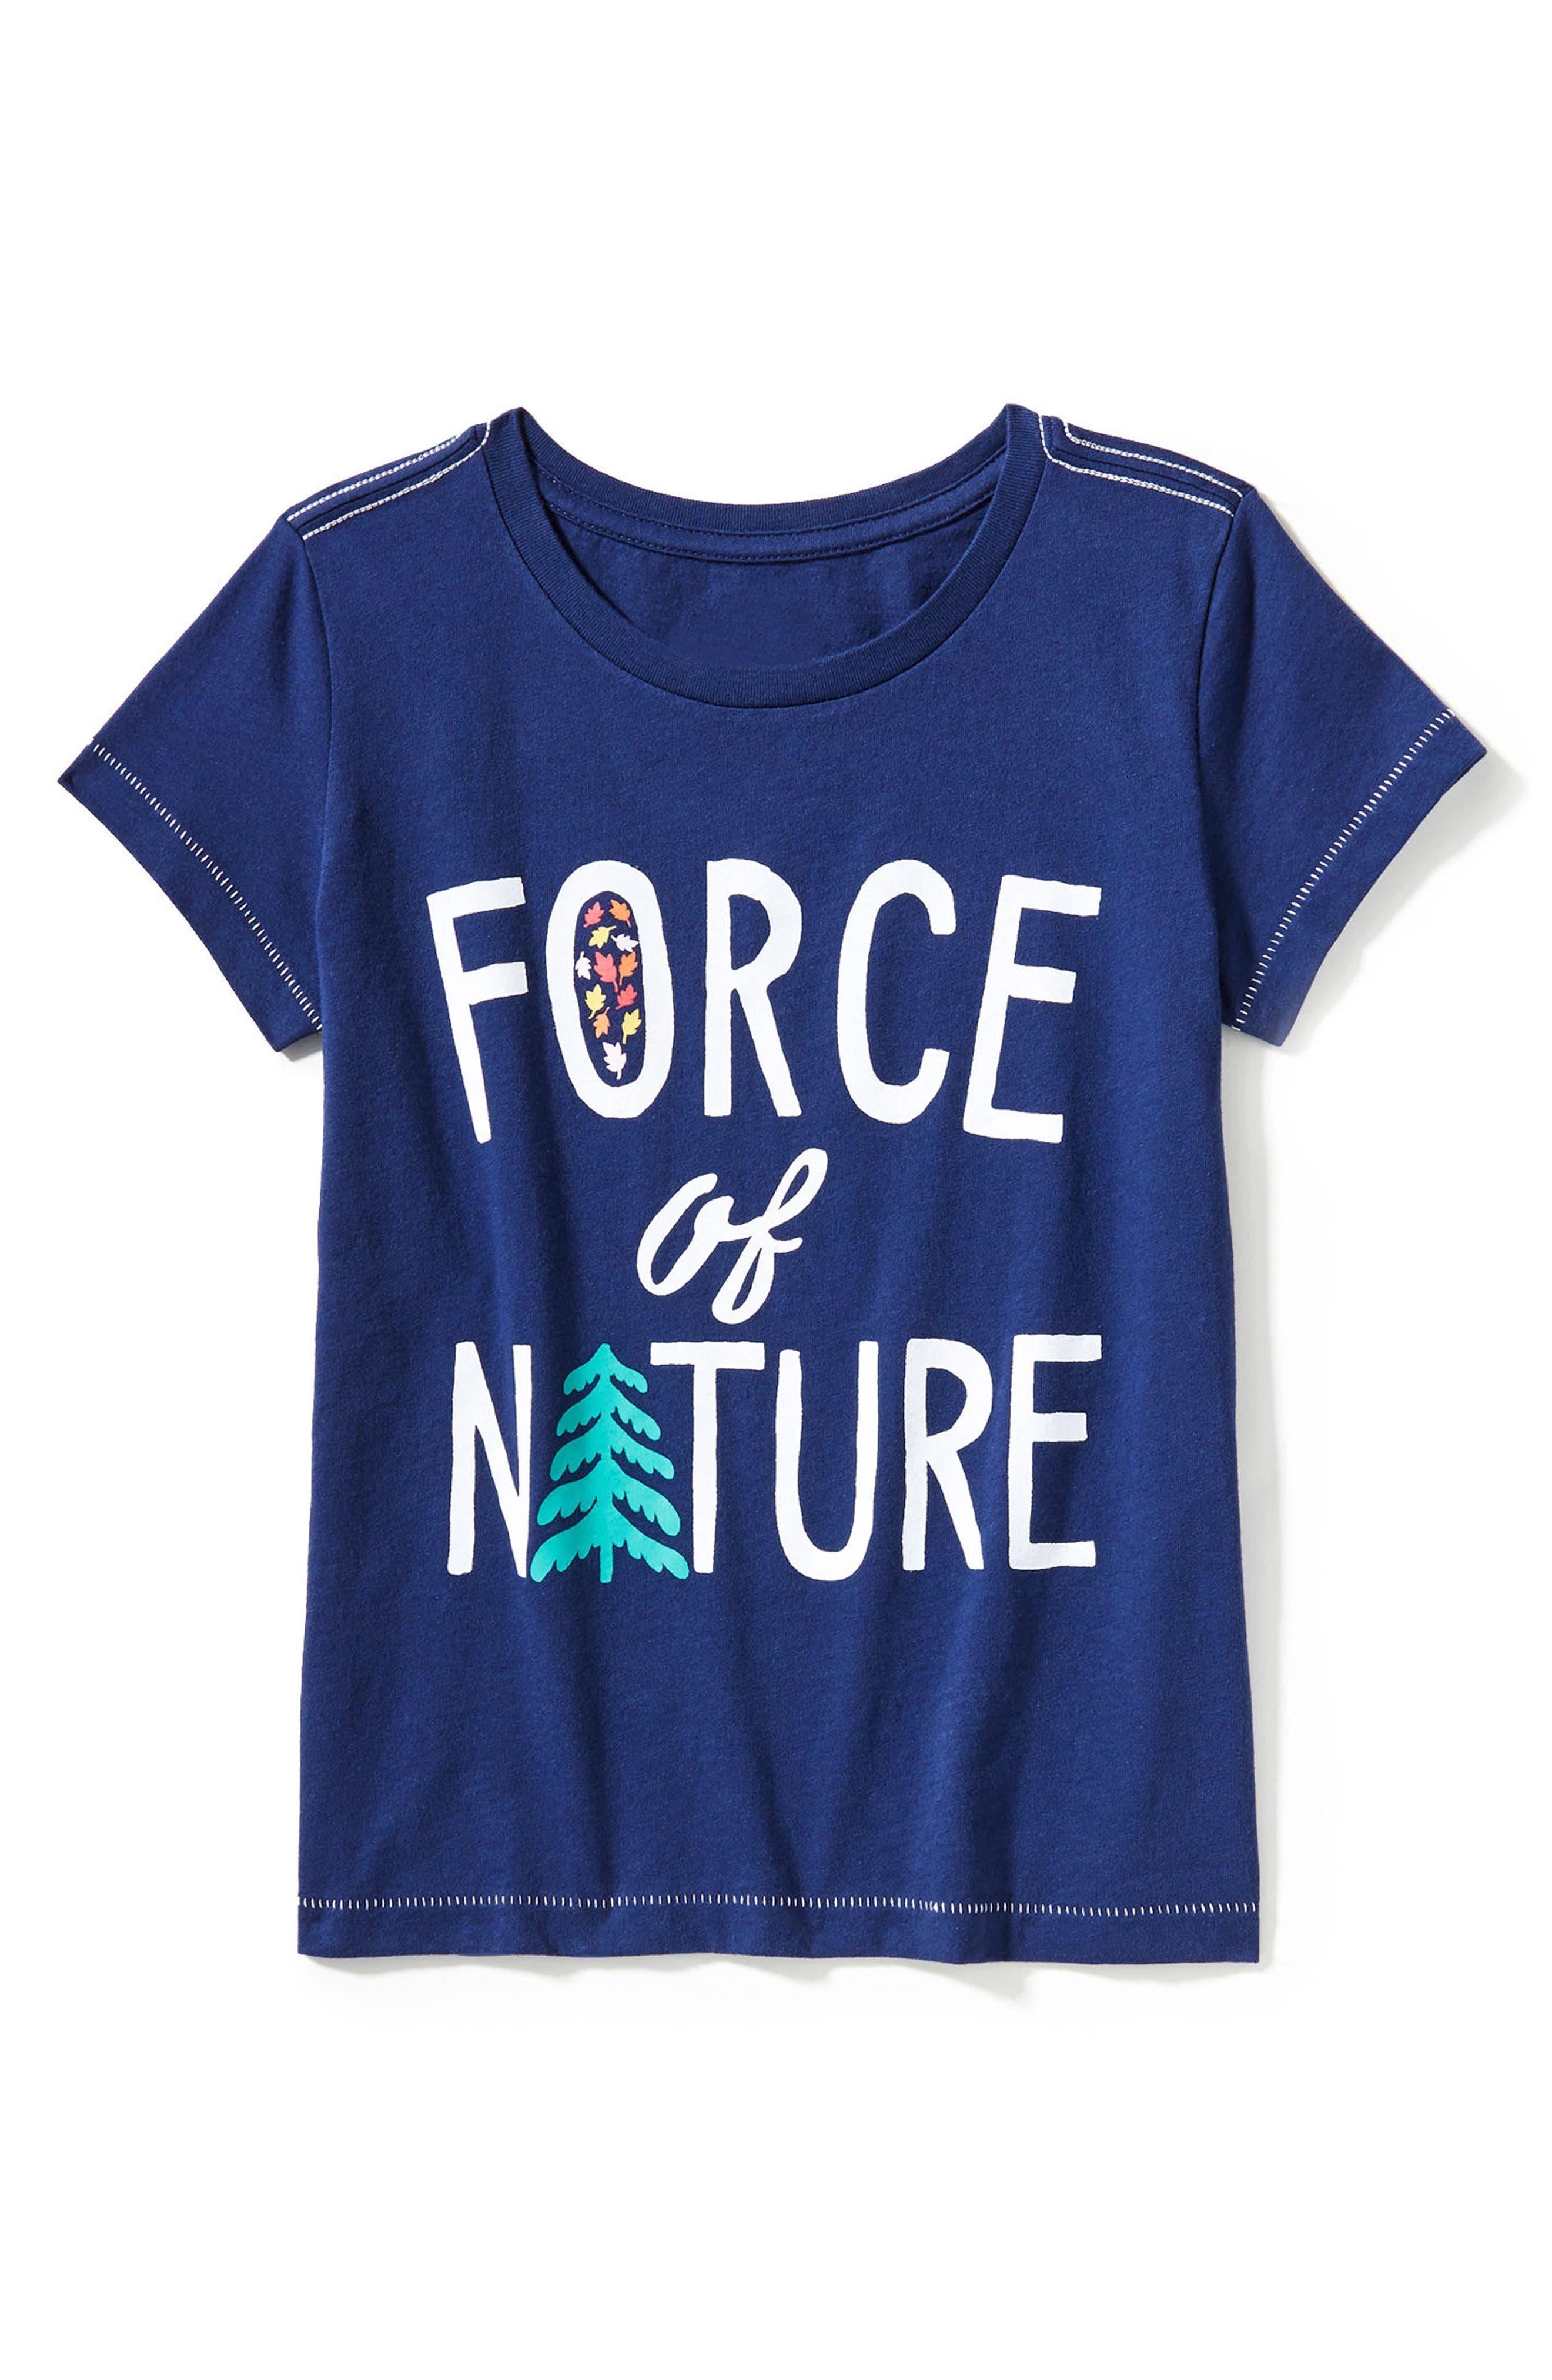 Alternate Image 1 Selected - Peek Force of Nature Graphic Tee (Toddler Girls, Little Girls & Big Girls)